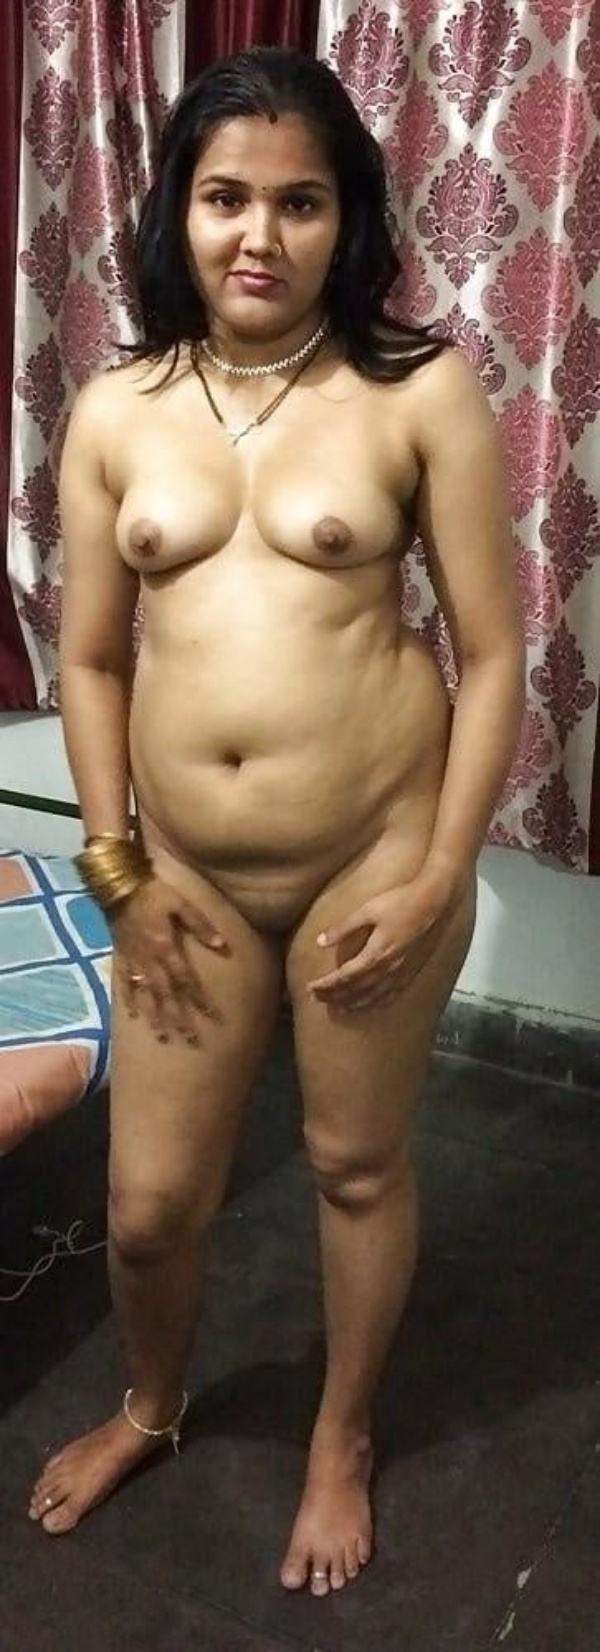 leaked sexy desi bhabhi hot photos honeymoon - 45